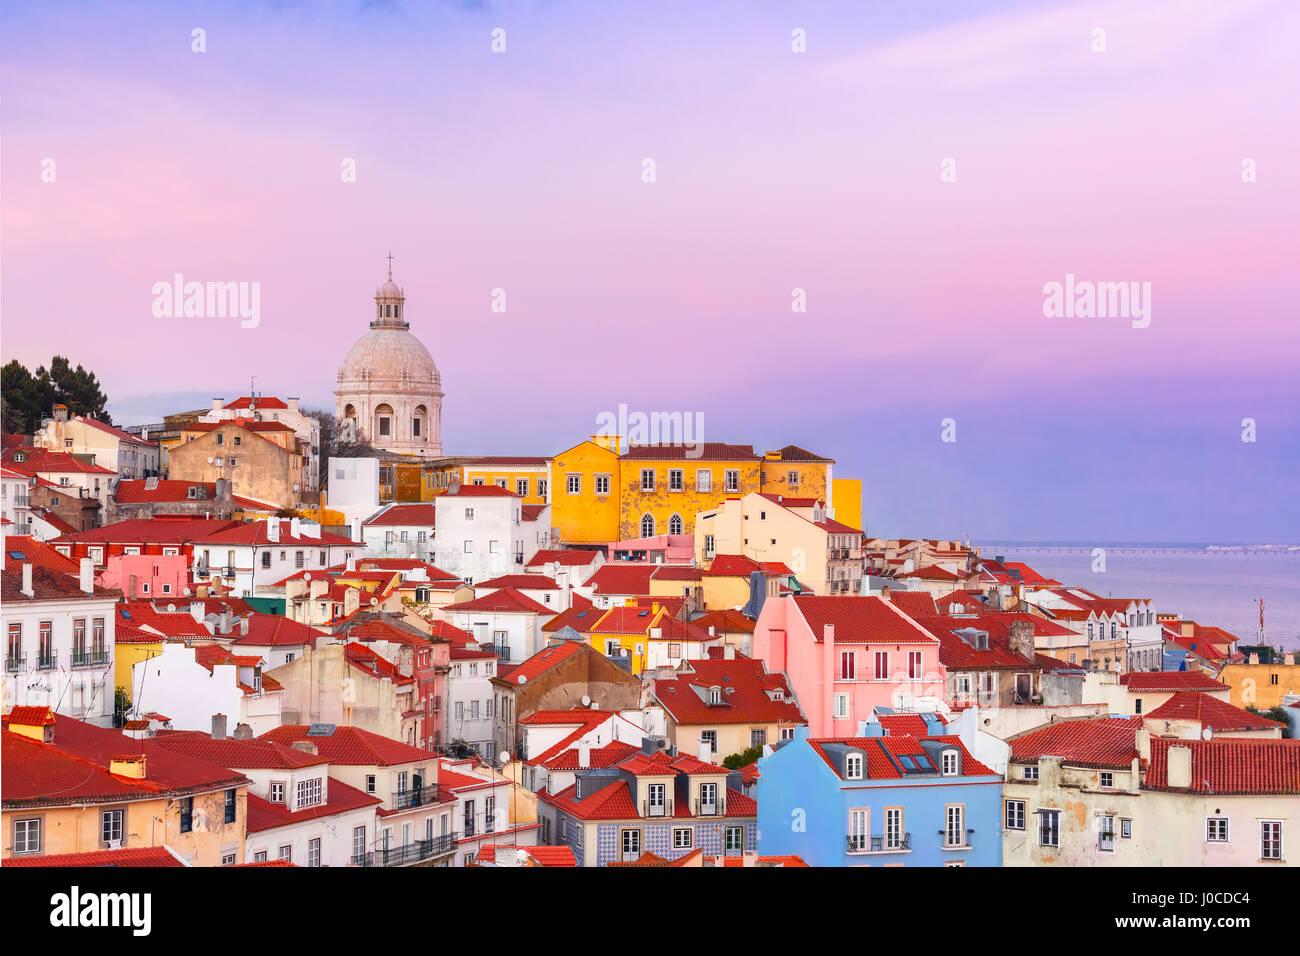 Alfama at scenic sunset, Lisbon, Portugal - Stock Image